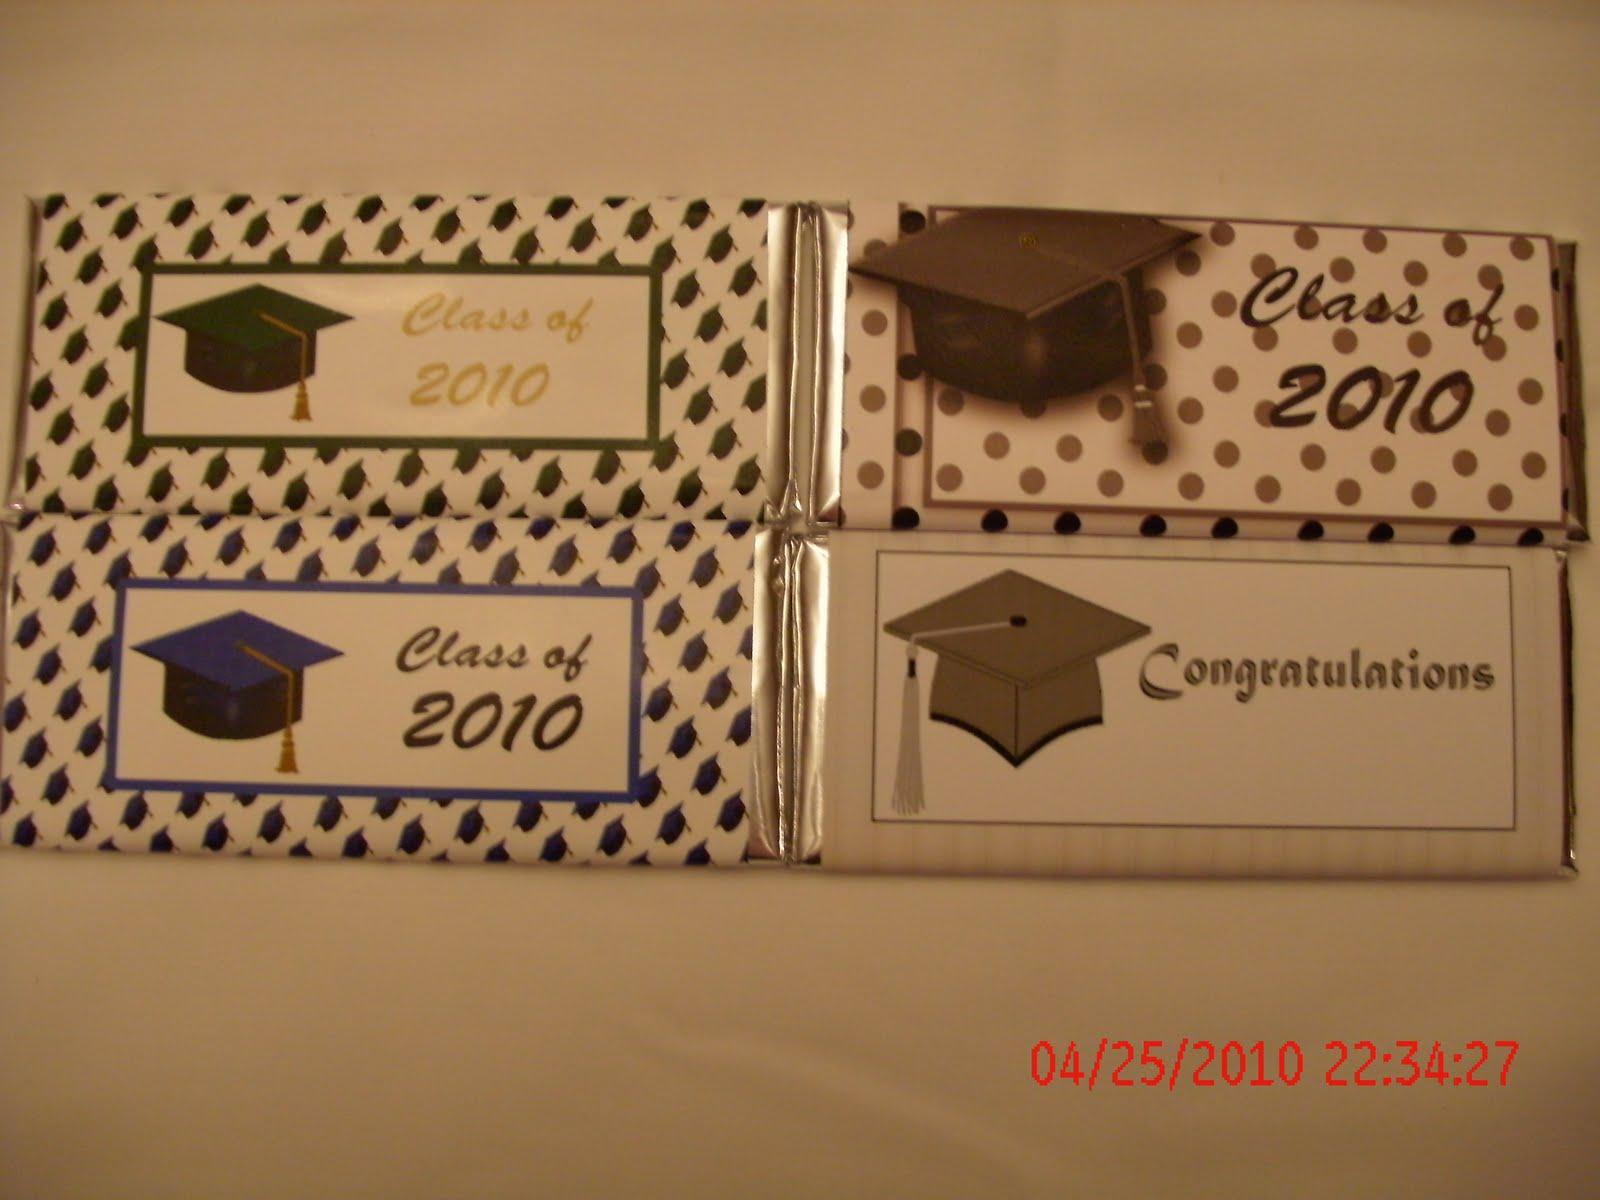 http://1.bp.blogspot.com/_RI-N6M6reek/S9rGFhU6NMI/AAAAAAAAAAU/rwxy3iJ-Gjs/s1600/GEDC0052.JPG